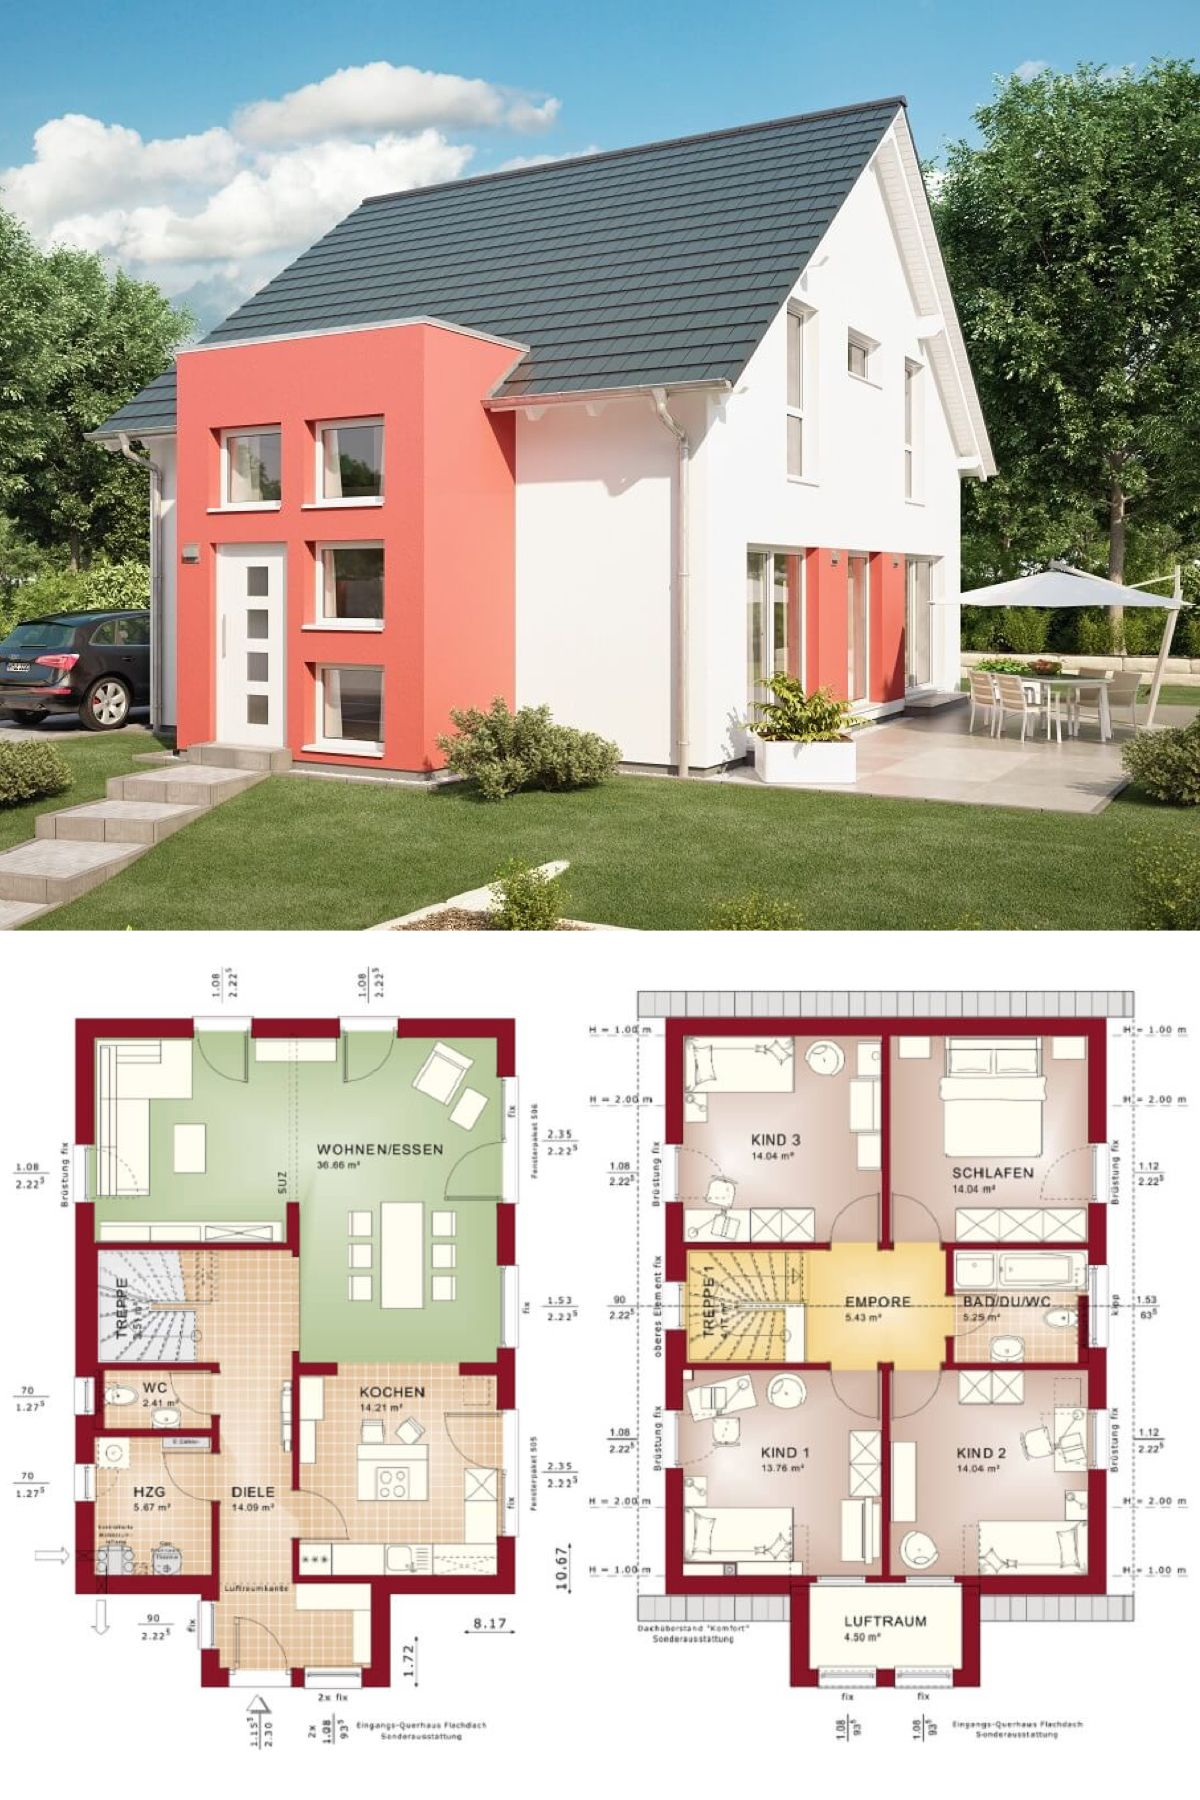 Haus Fassade Mit Roten Farbakzenten   Fertighaus Grundriss Celebration 137  V7 Bien Zenker   HausbauDirekt.